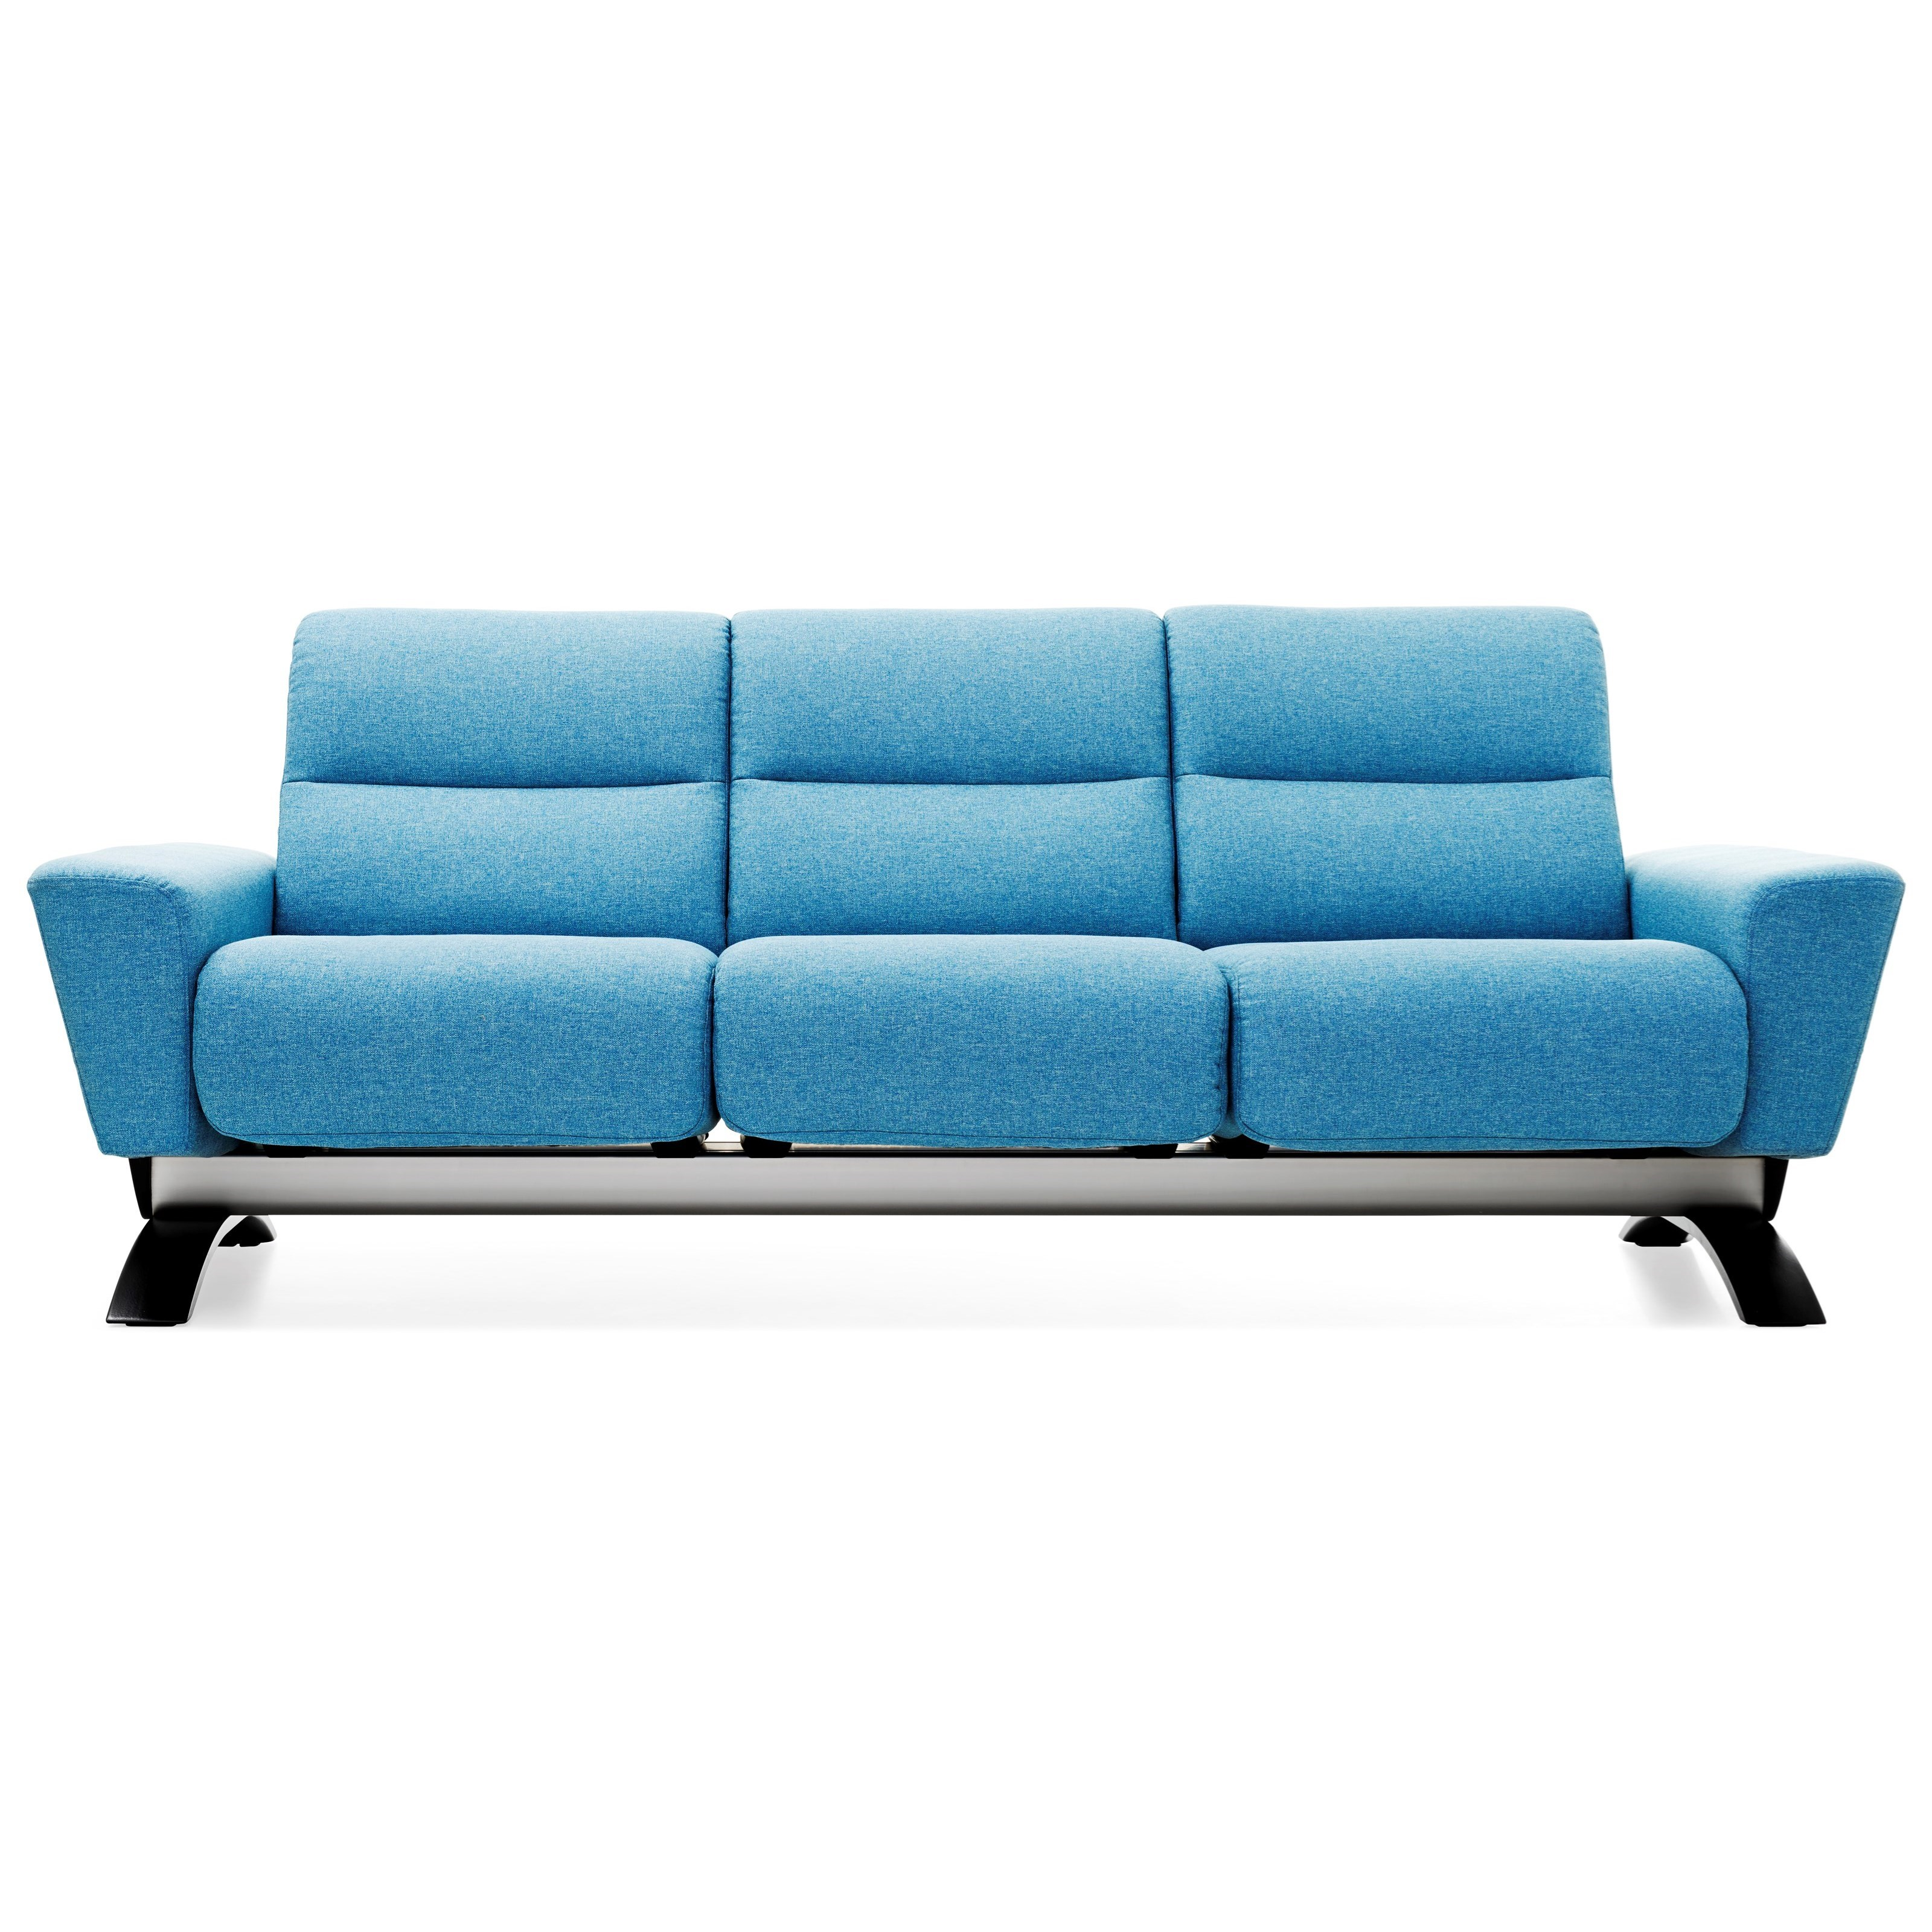 Stressless Stressless You Julia 3 Seater Sofa   Item Number: YOU JULIA